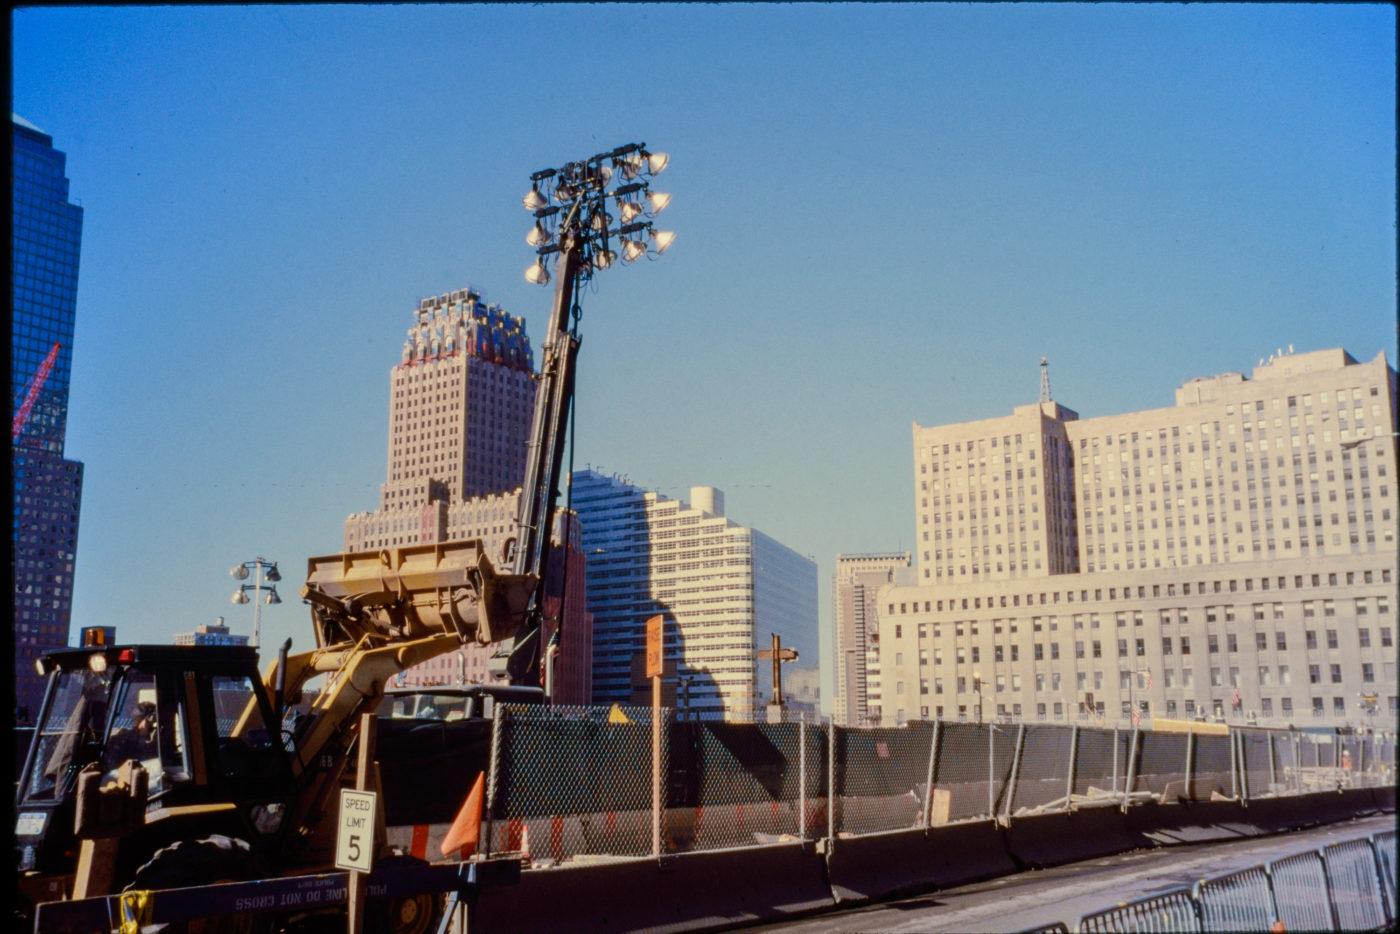 Construction Vehicles at WTC, Barren Space.jpg